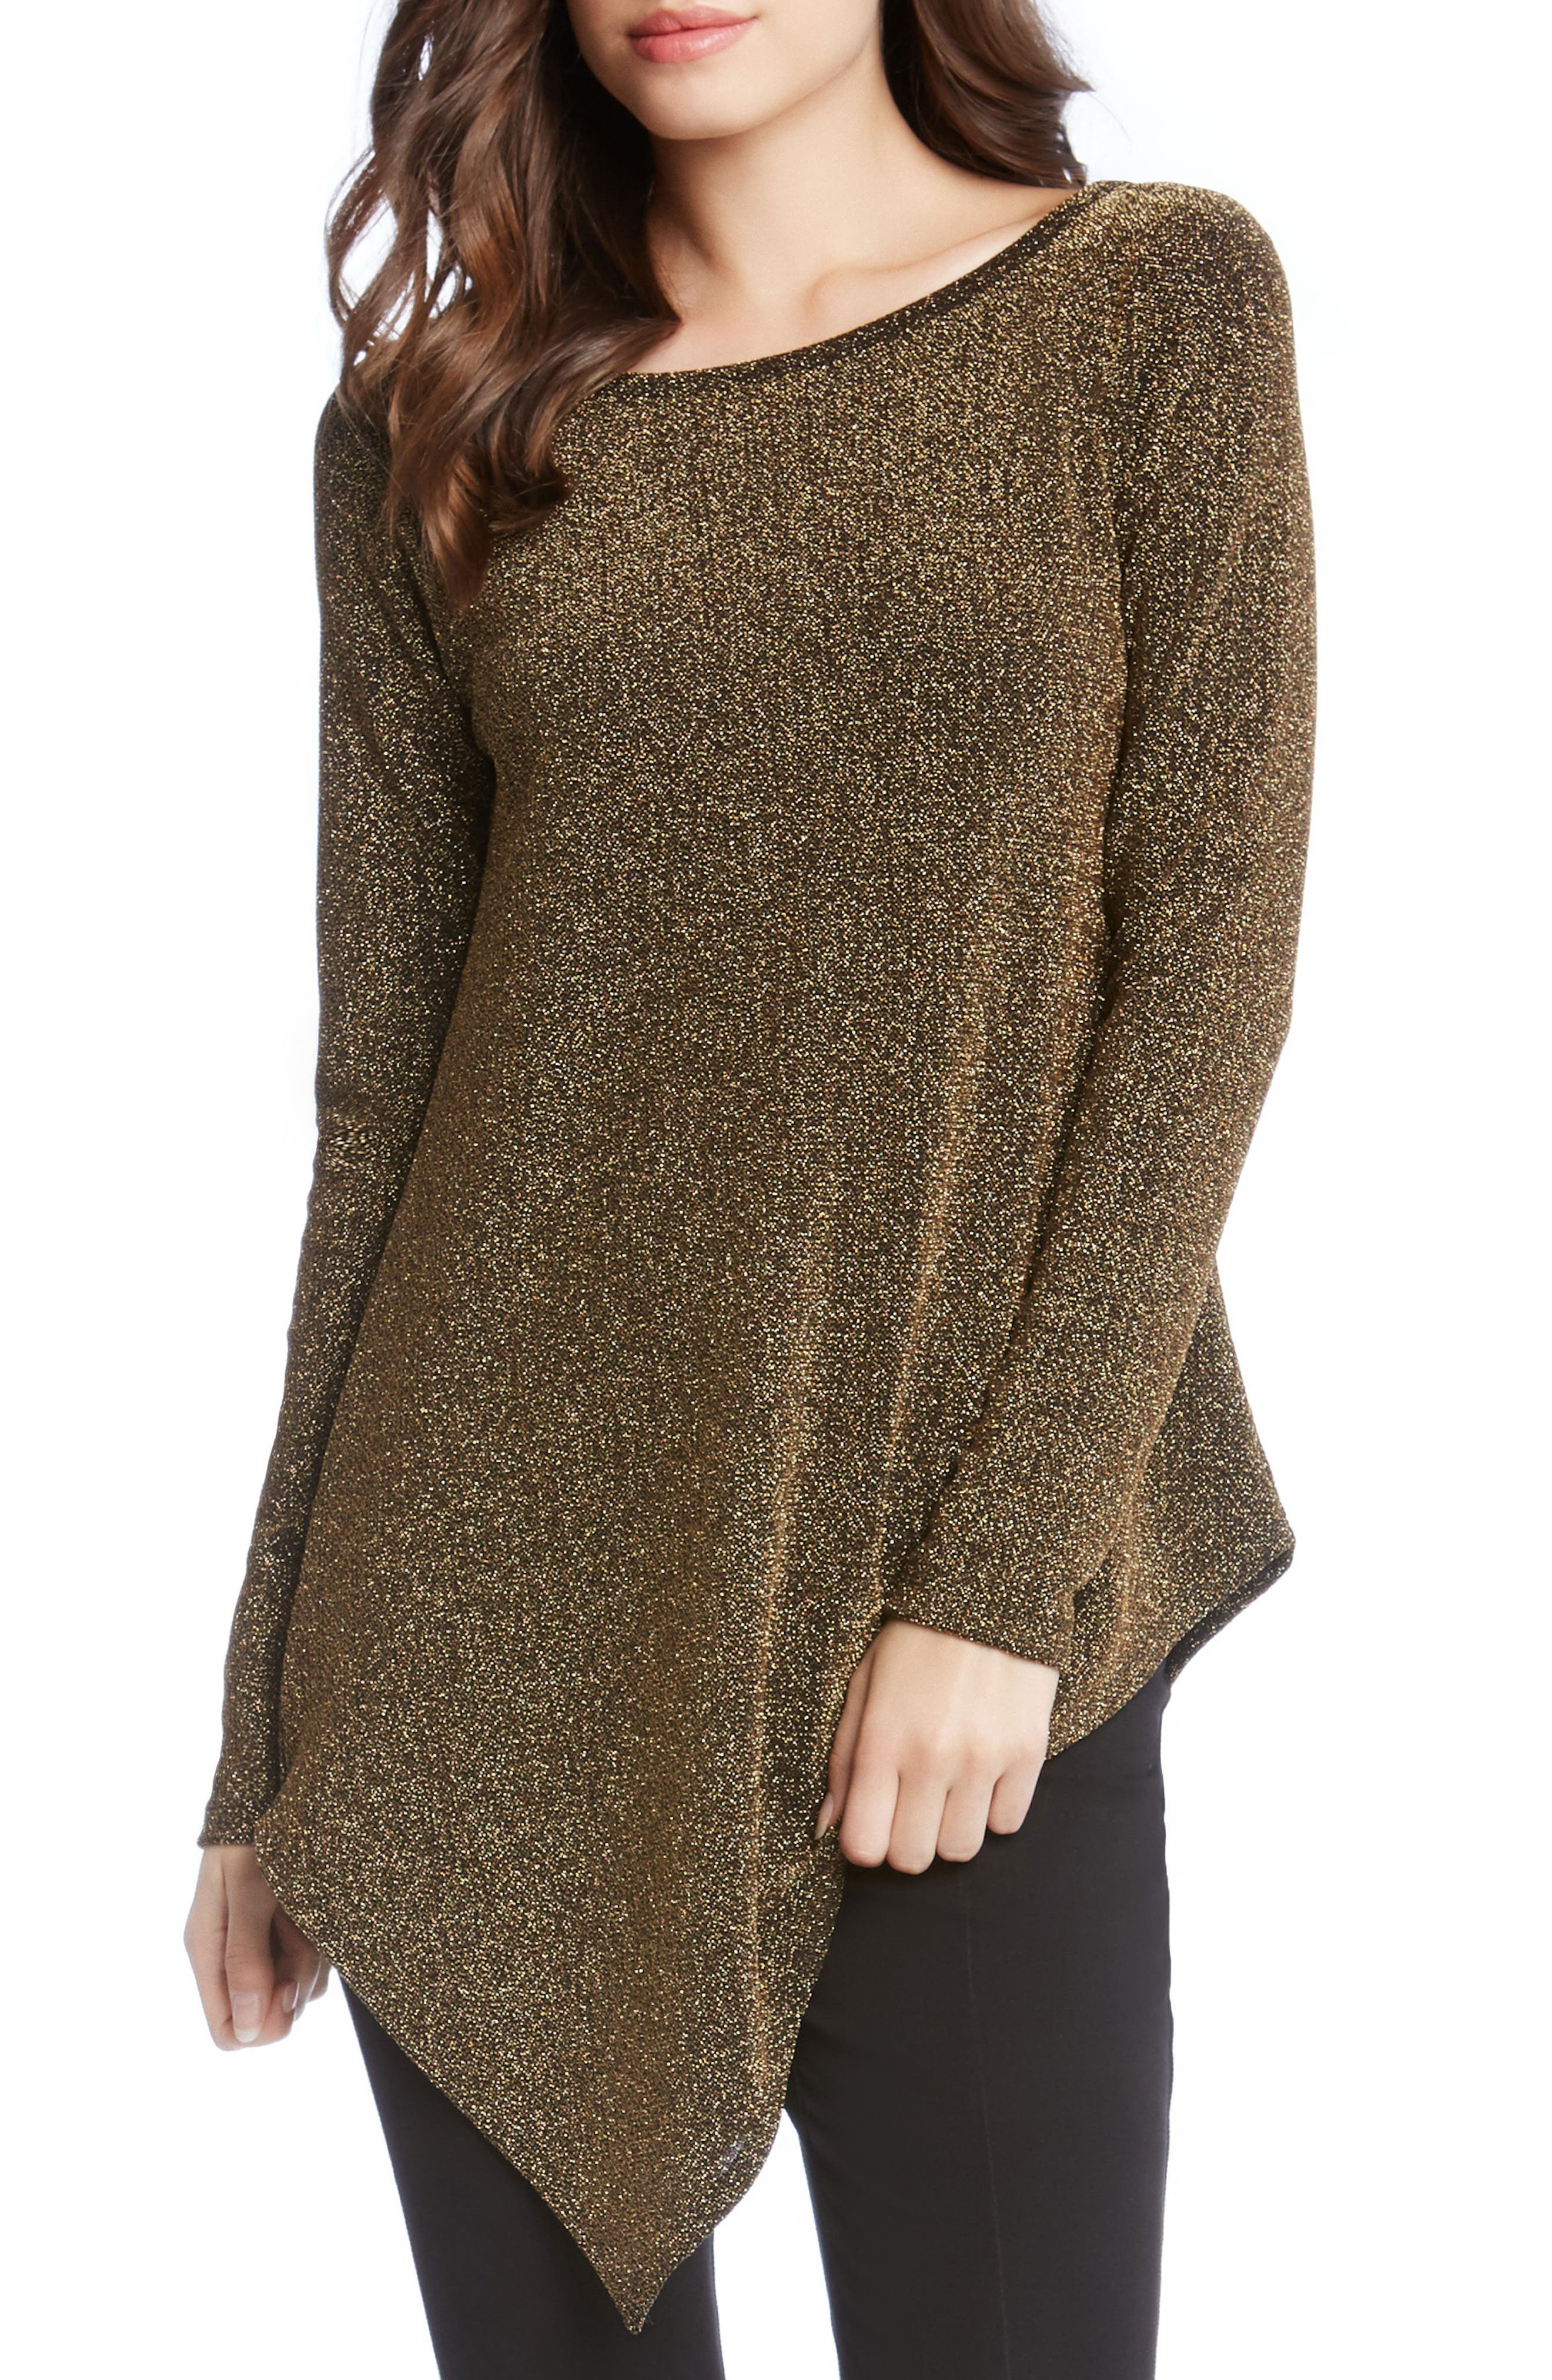 Alternate Image 1 Selected - Karen Kane Gold Knit Asymmetrical Hem Top